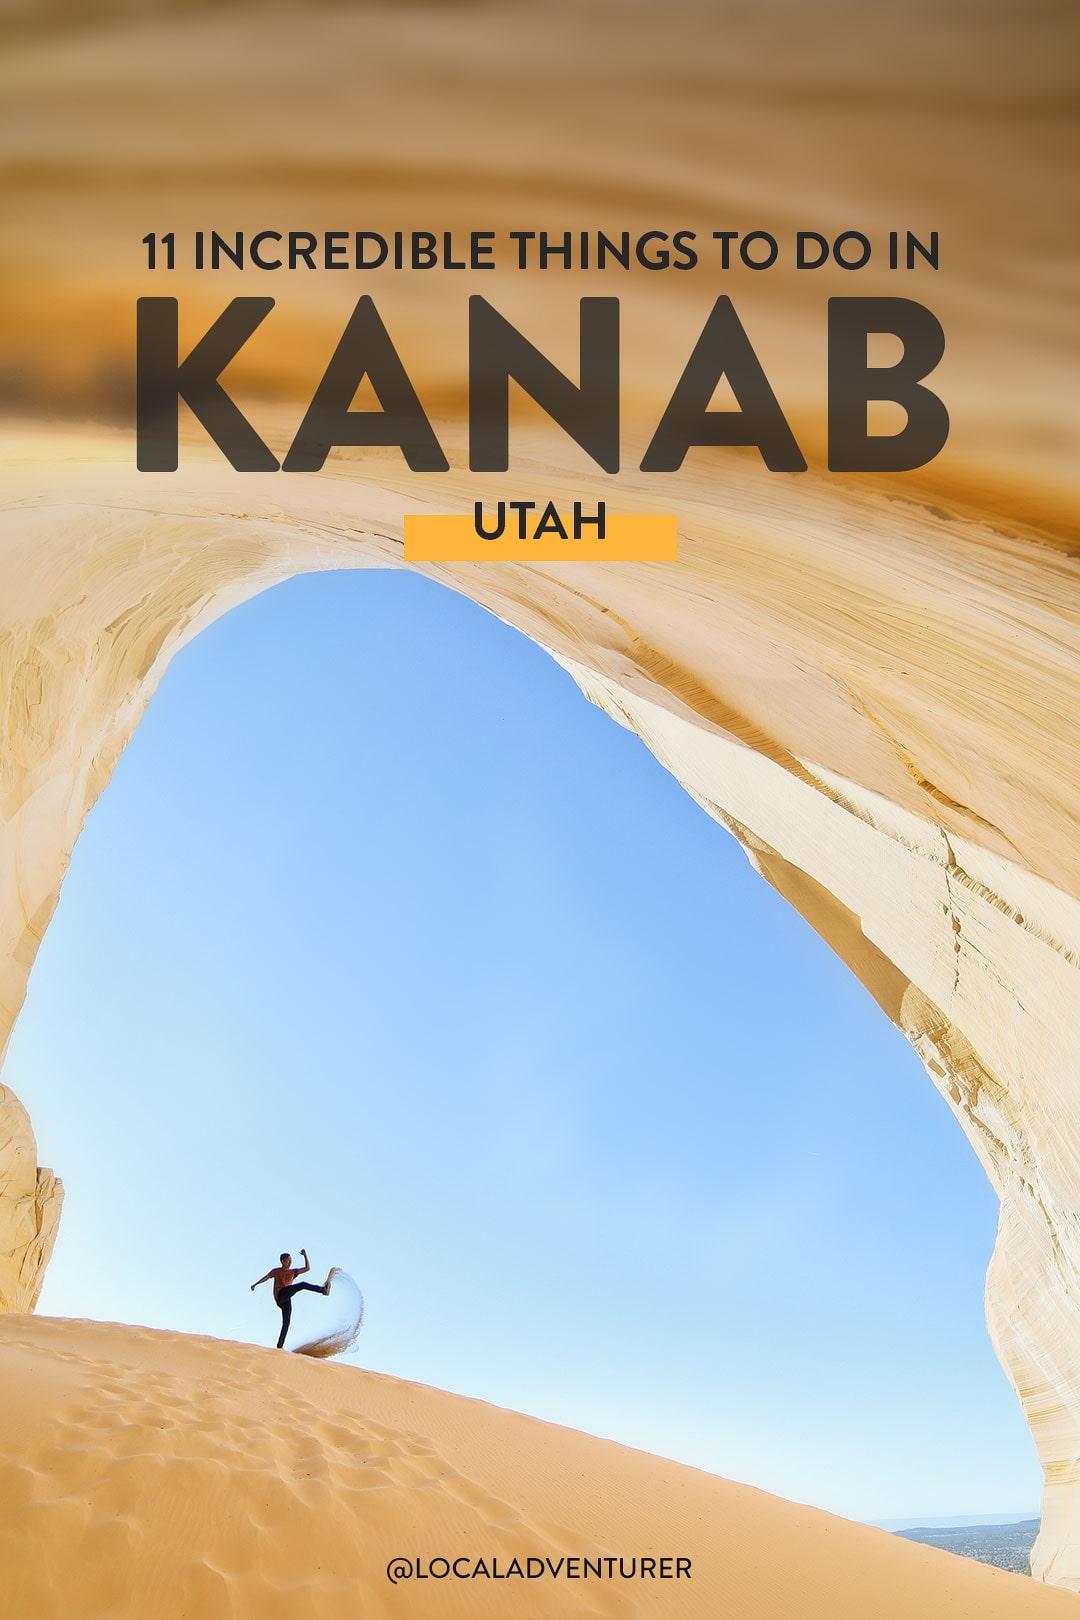 11+ Breathtaking Things to Do in Kanab Utah